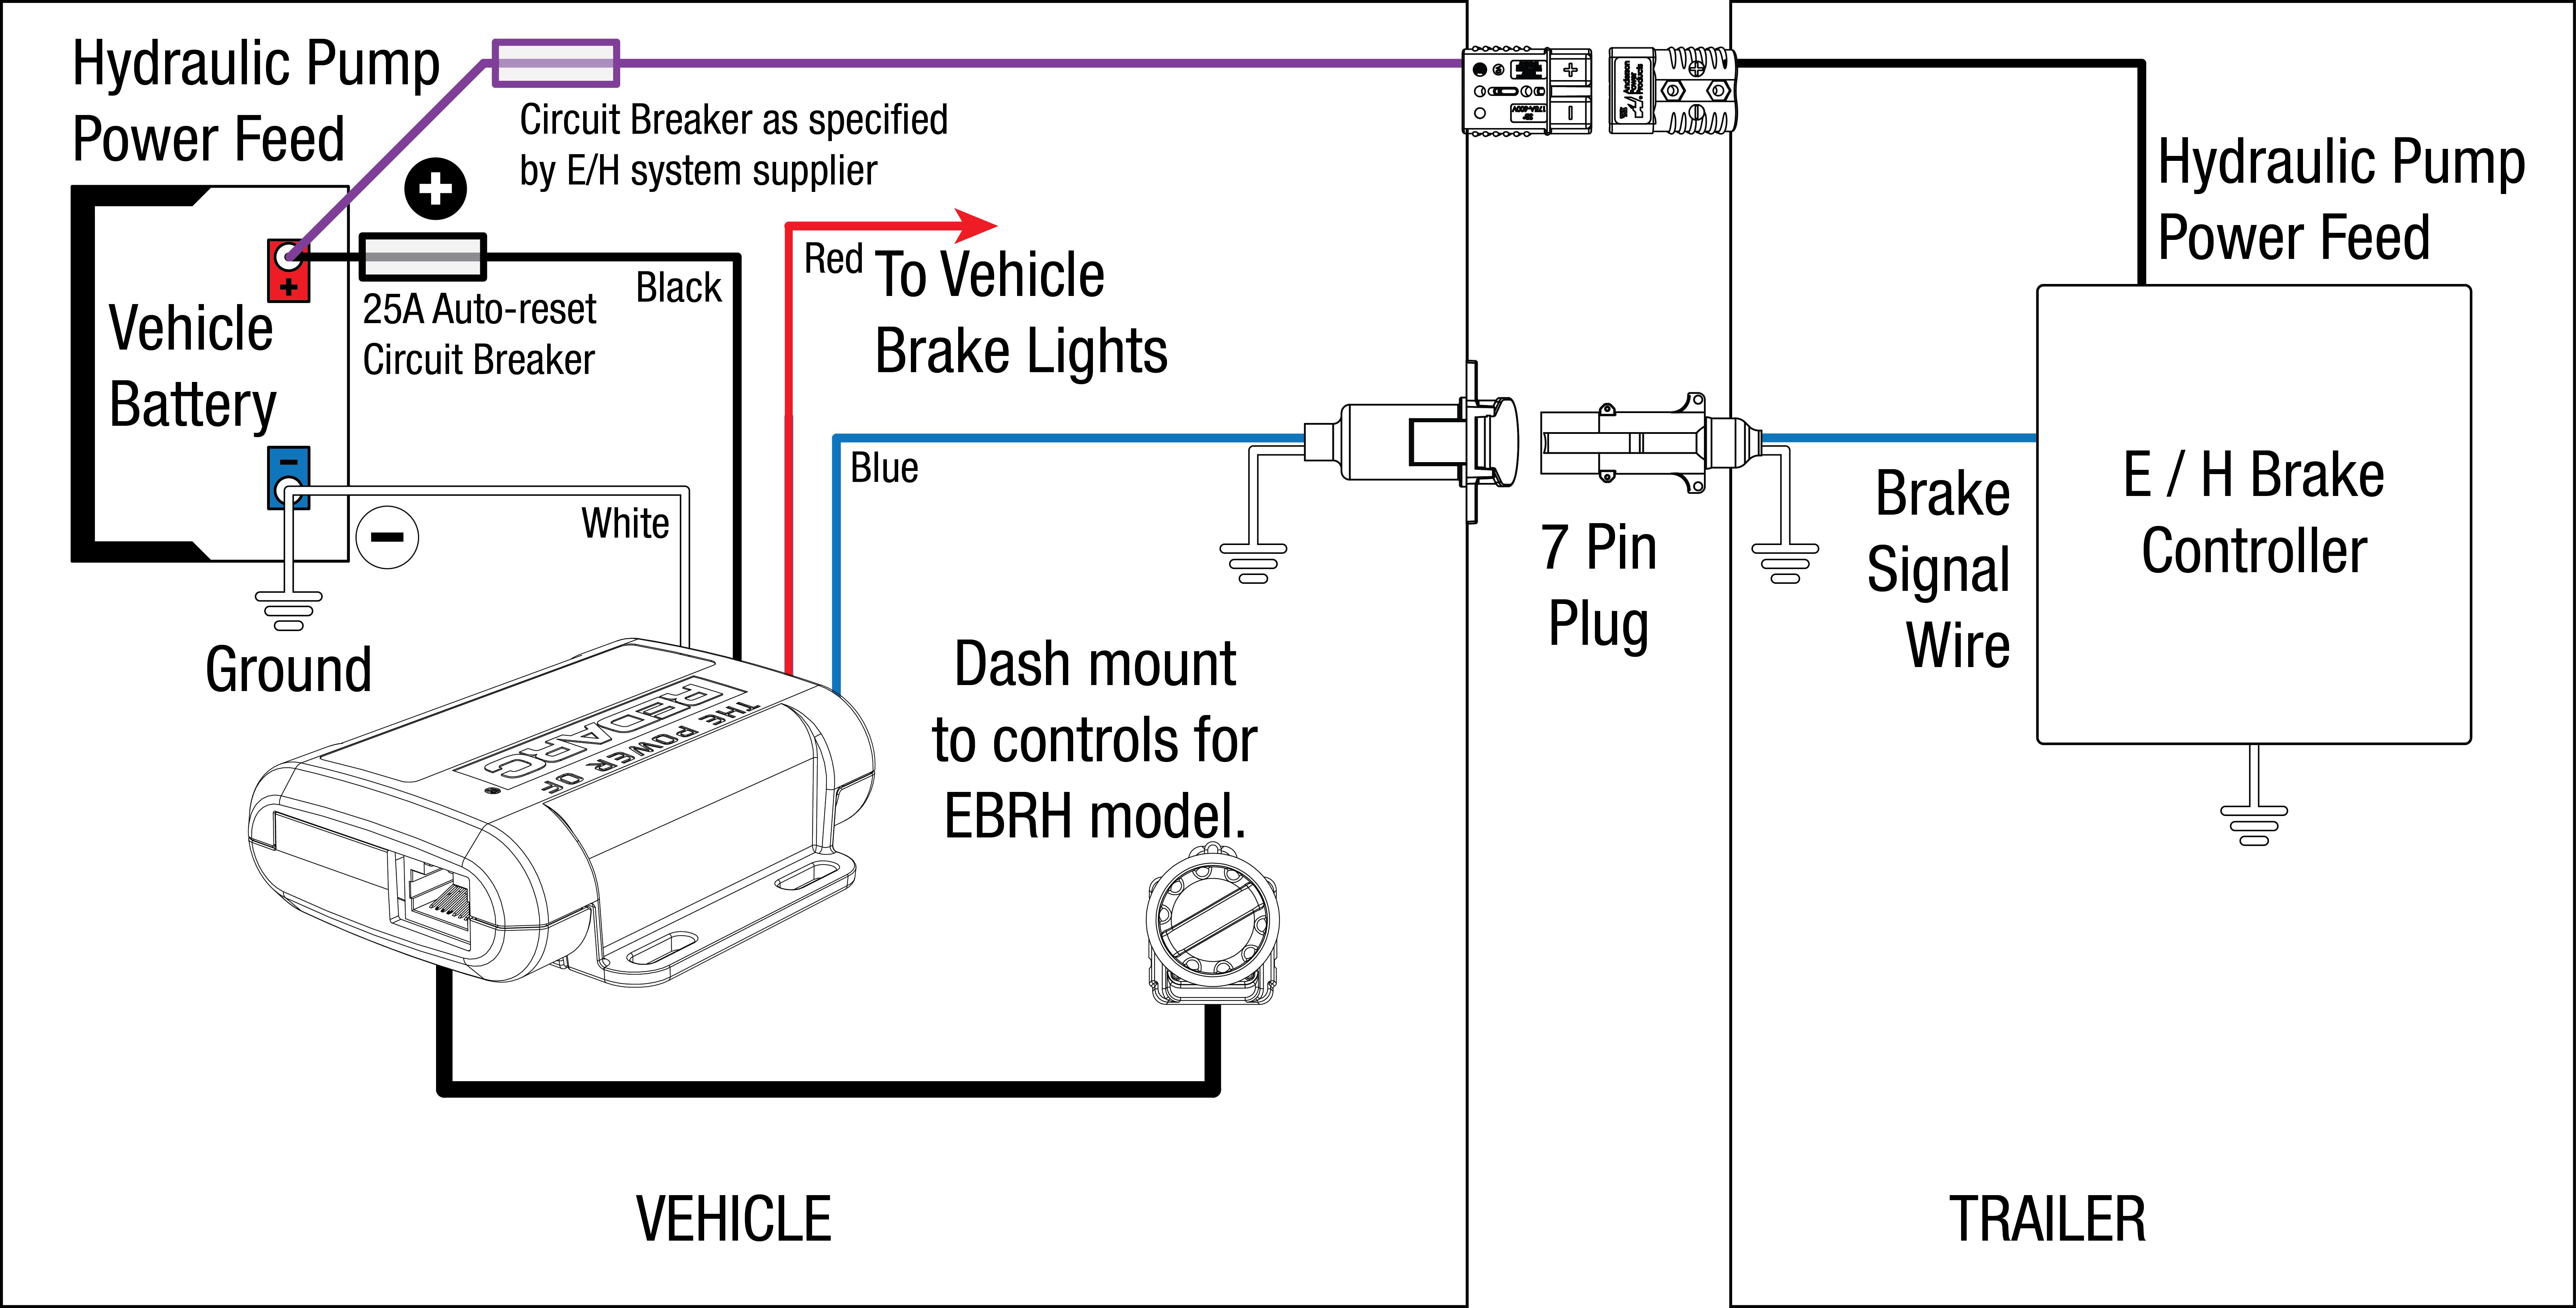 Tow-Pro Electric/hydraulic Braking Systems | Redarc Electronics - Electric Brake Wiring Diagram